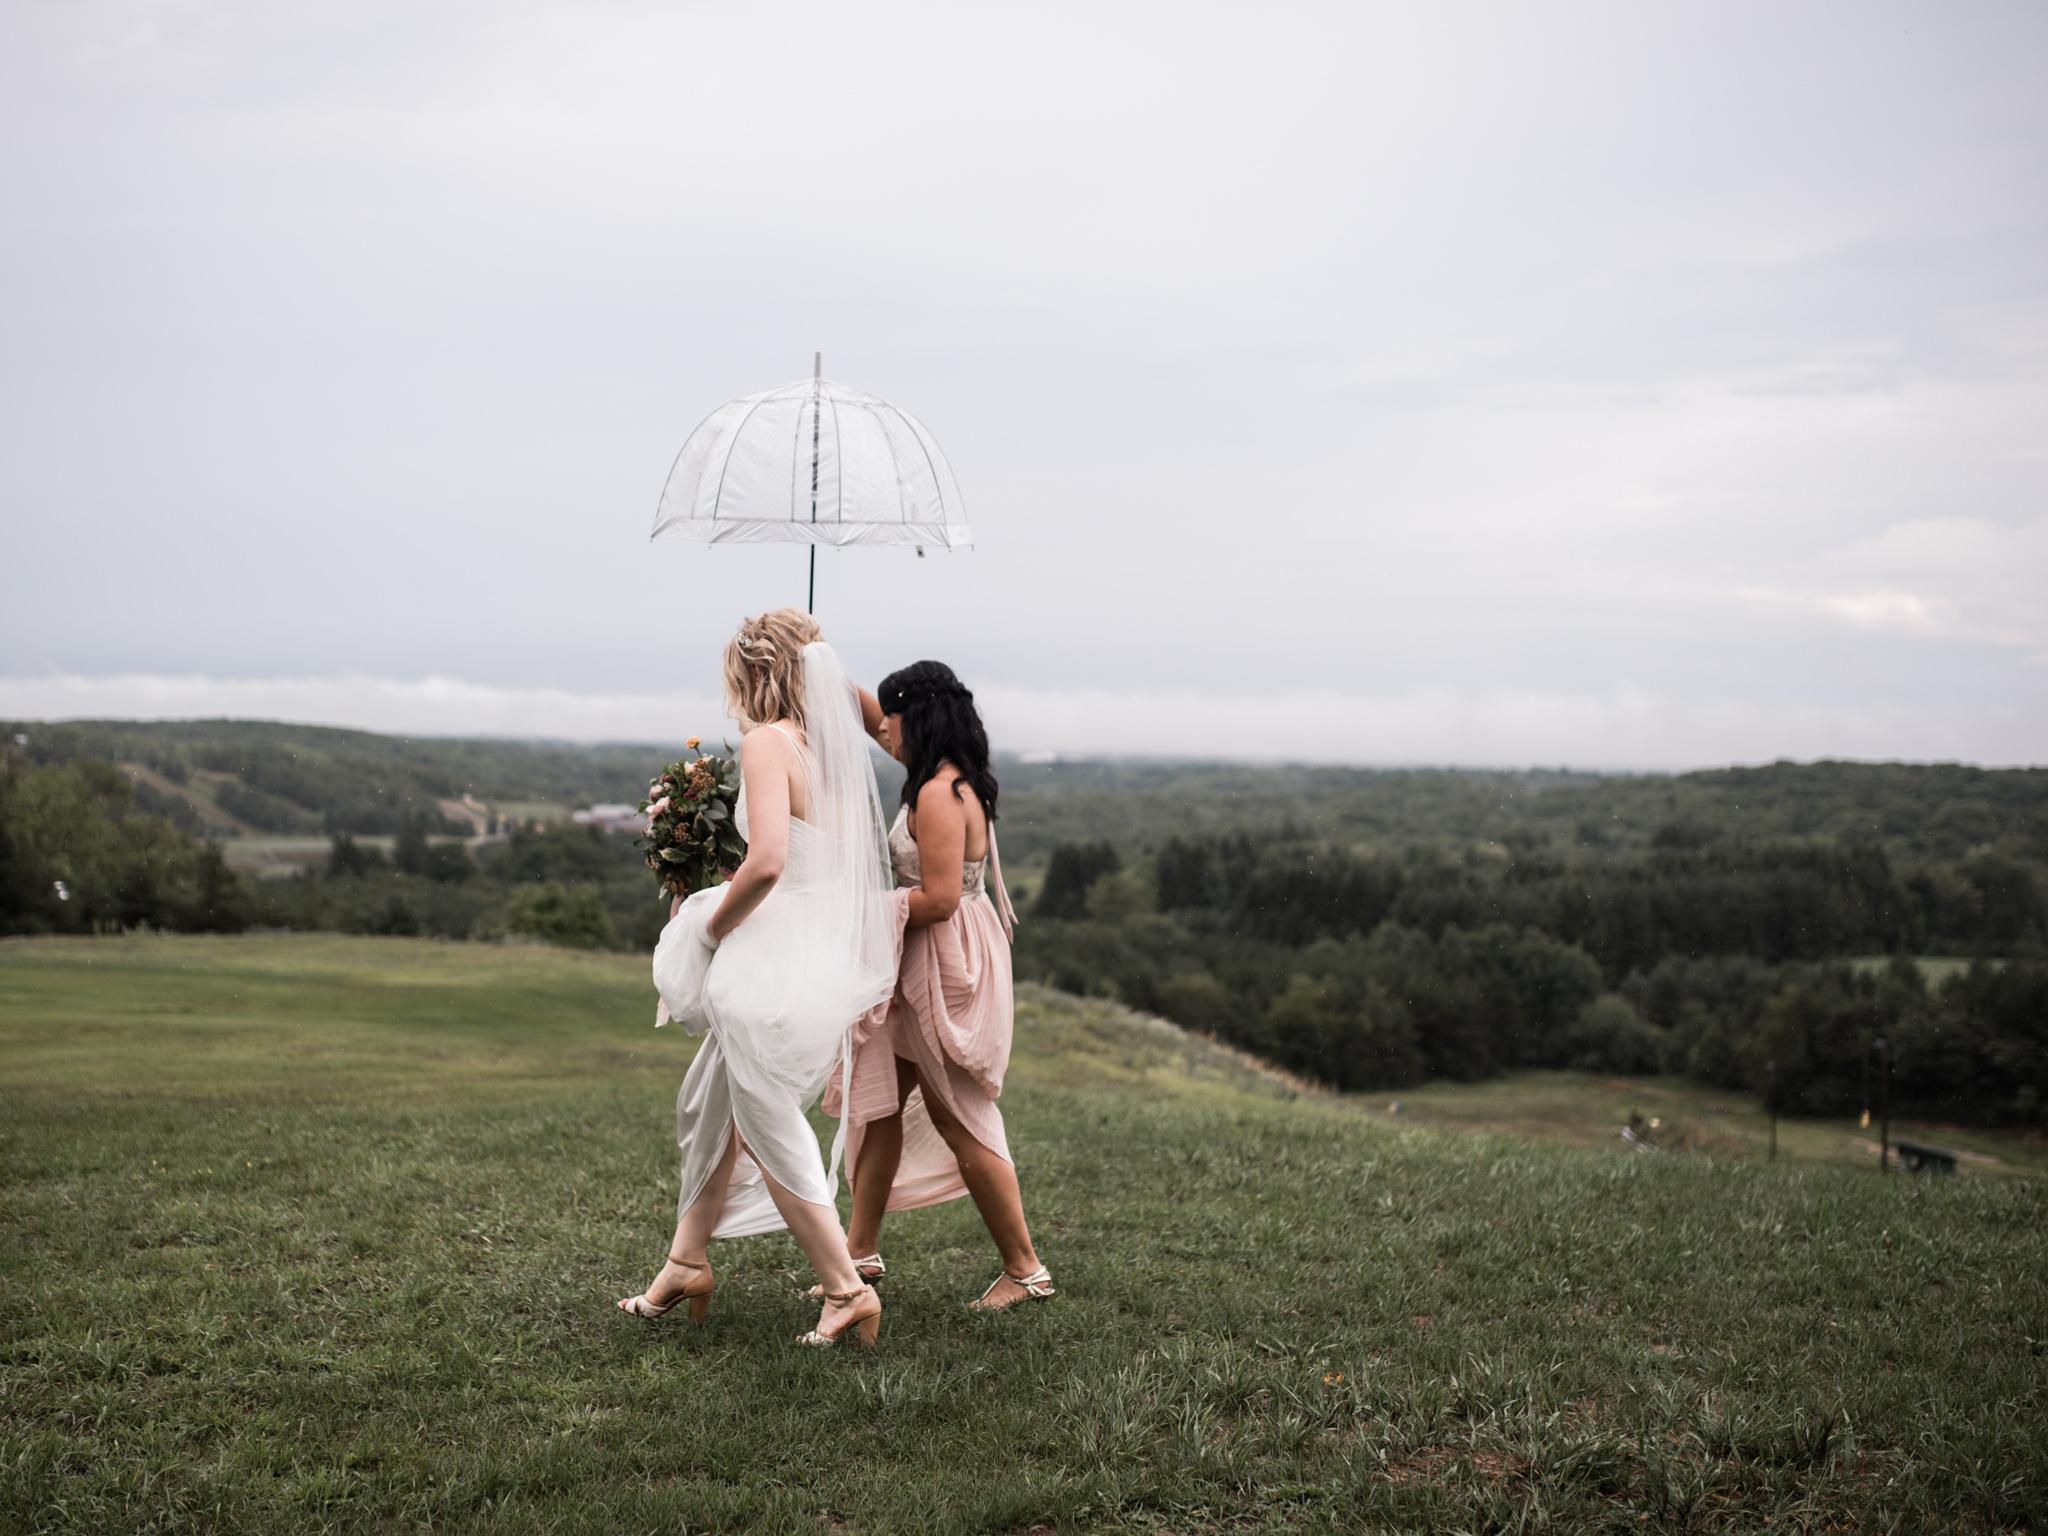 skyloft-wedding-toronto-wedding-photographer-27.jpg